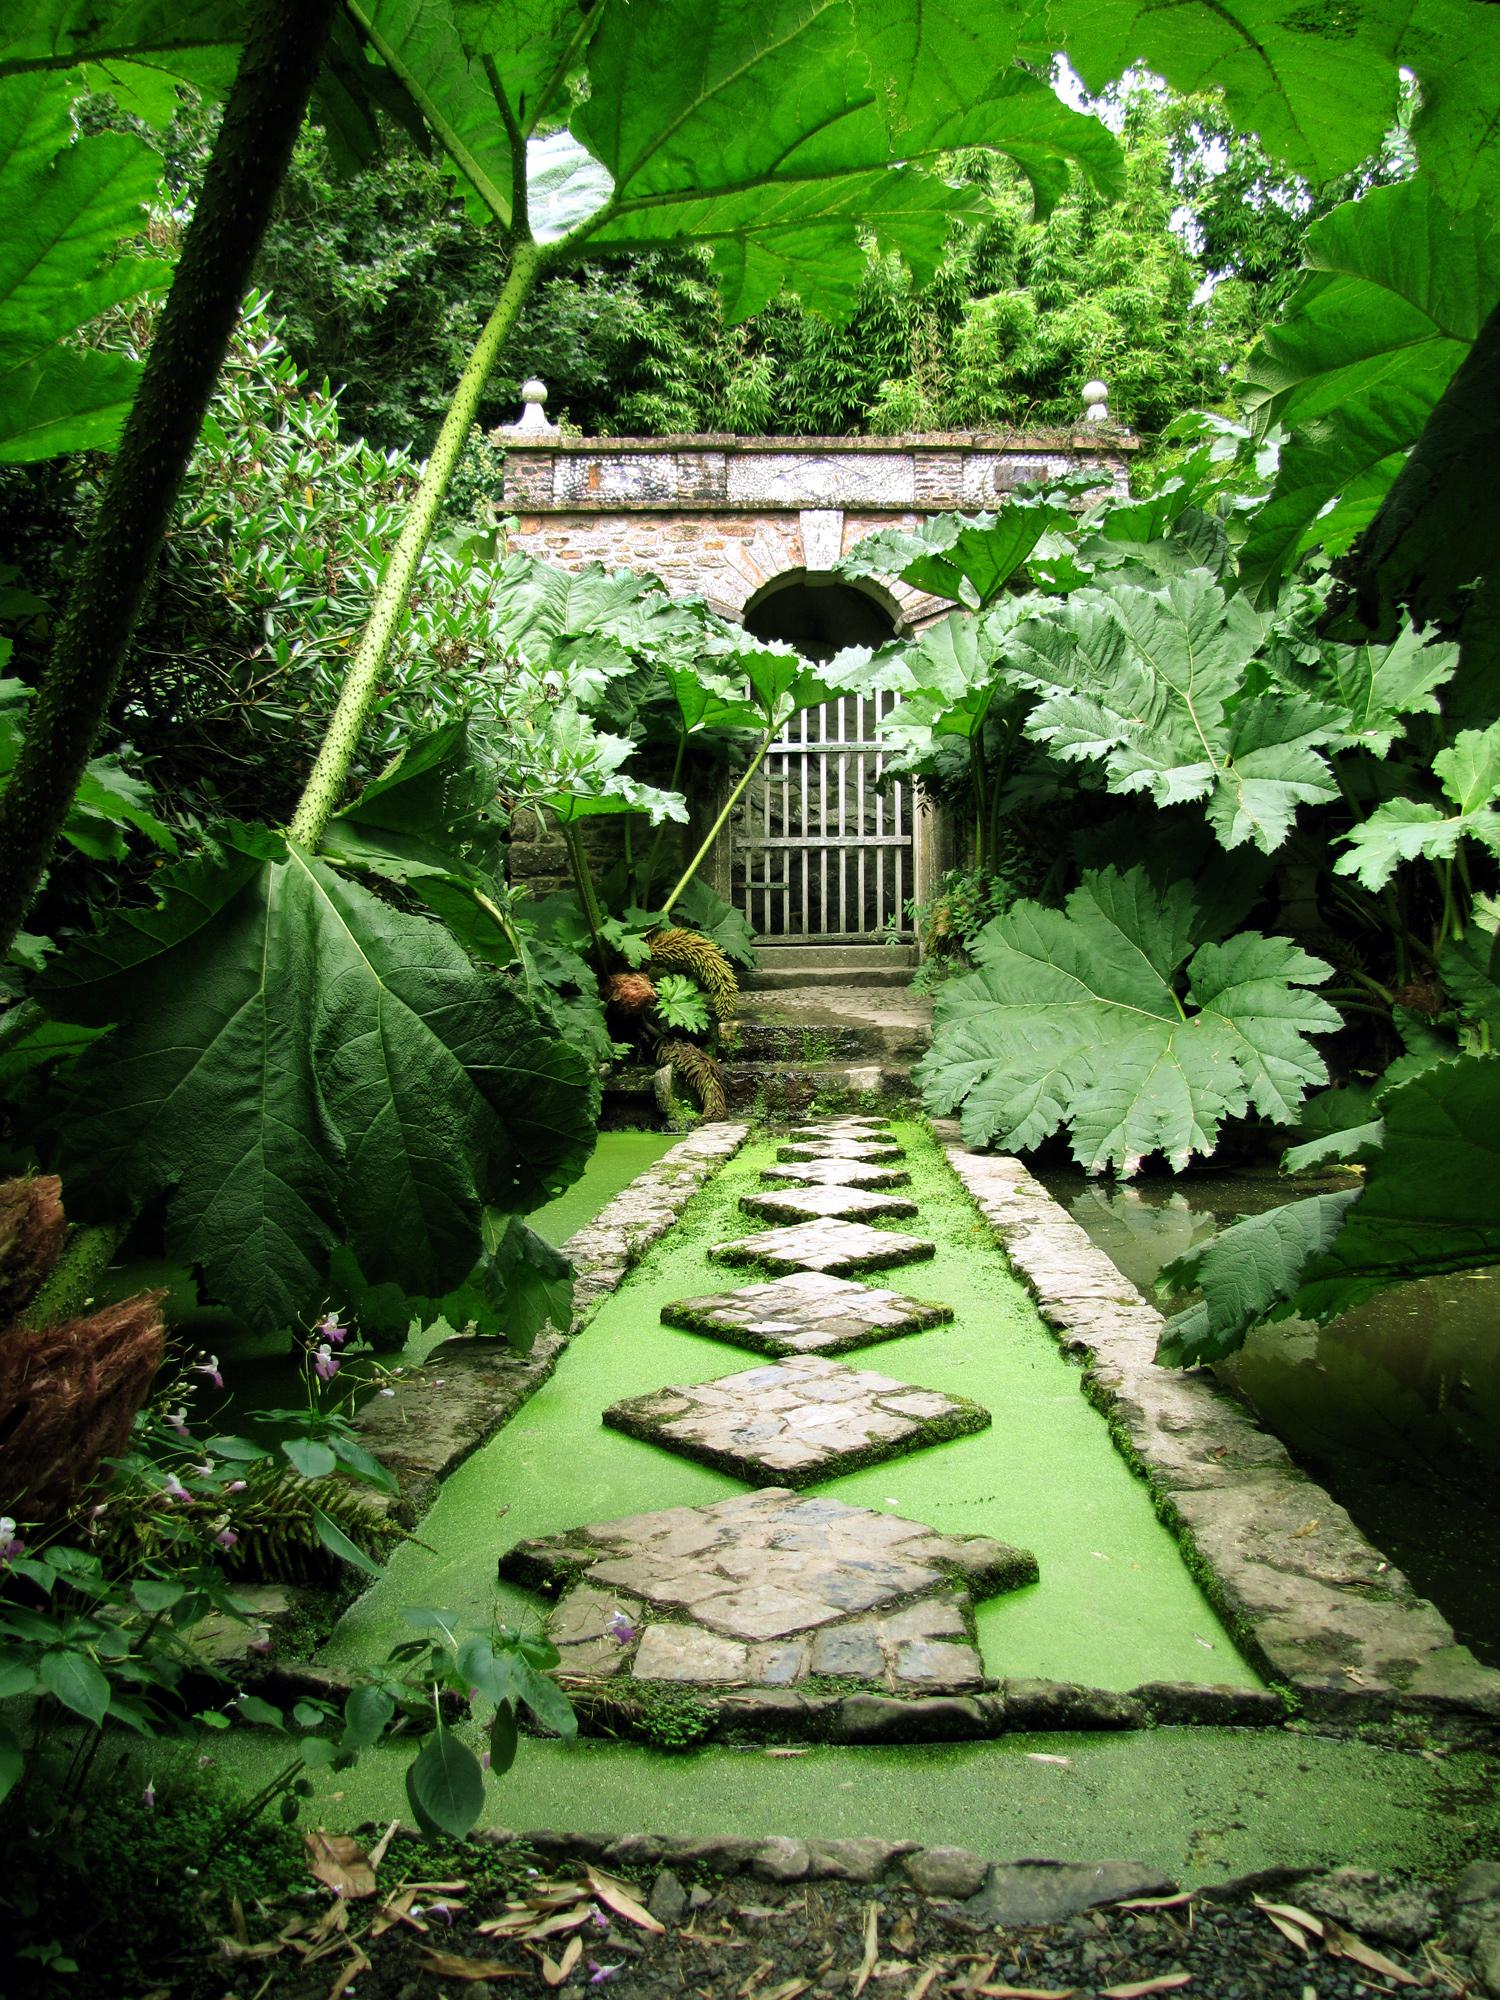 Jardins de kerdalo wikip dia - Jardins a l anglaise ...